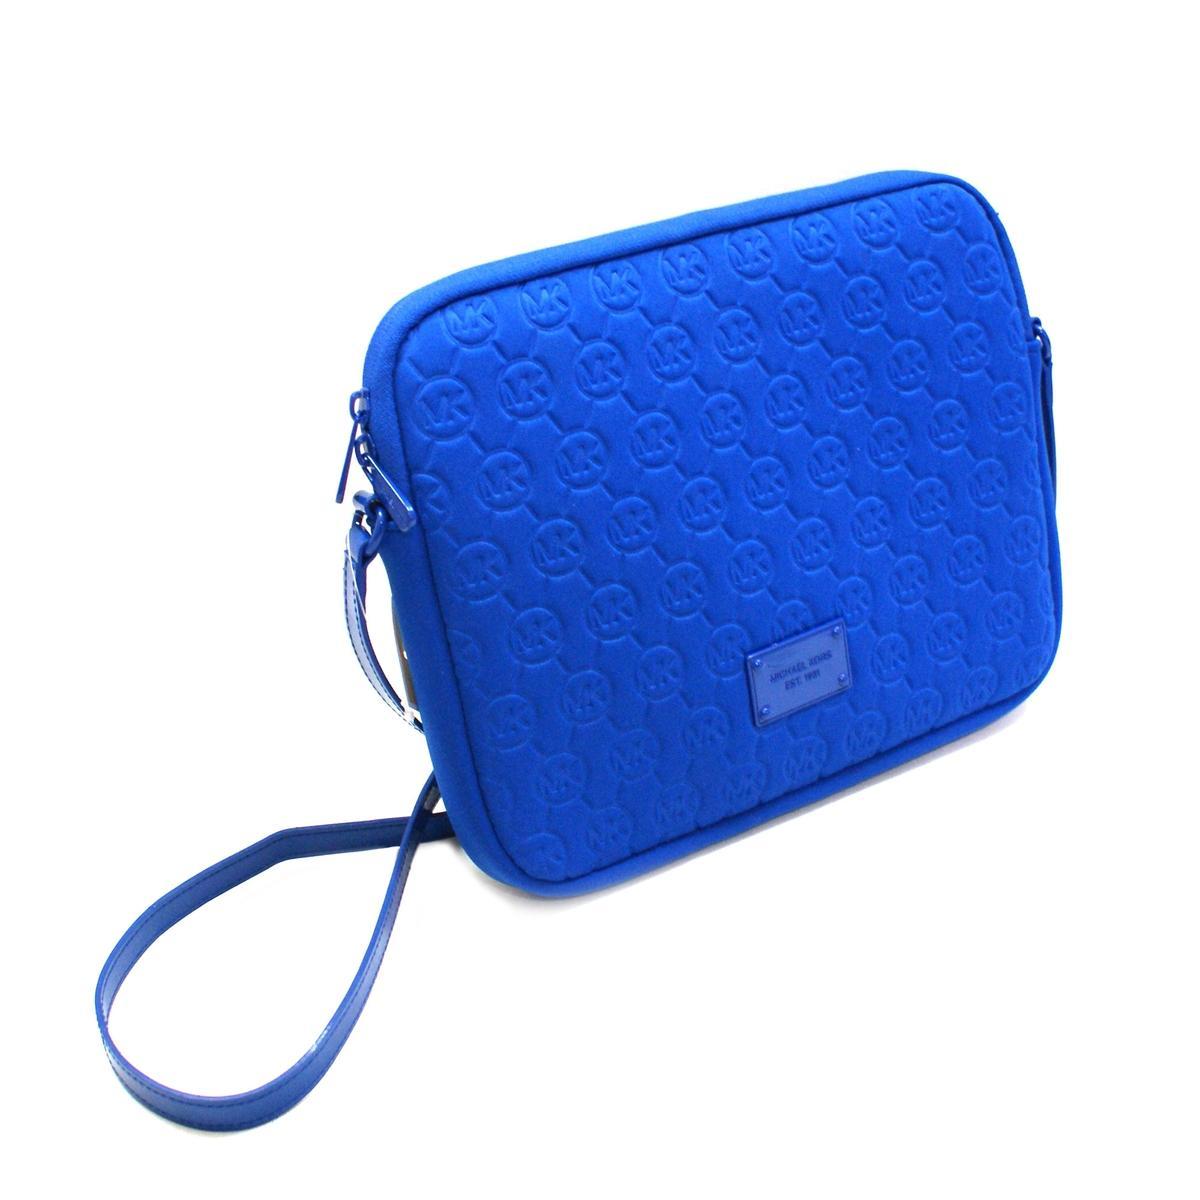 authentic michael kors online outlet o5dz  michael kor outlet online michael kors royal blue bag